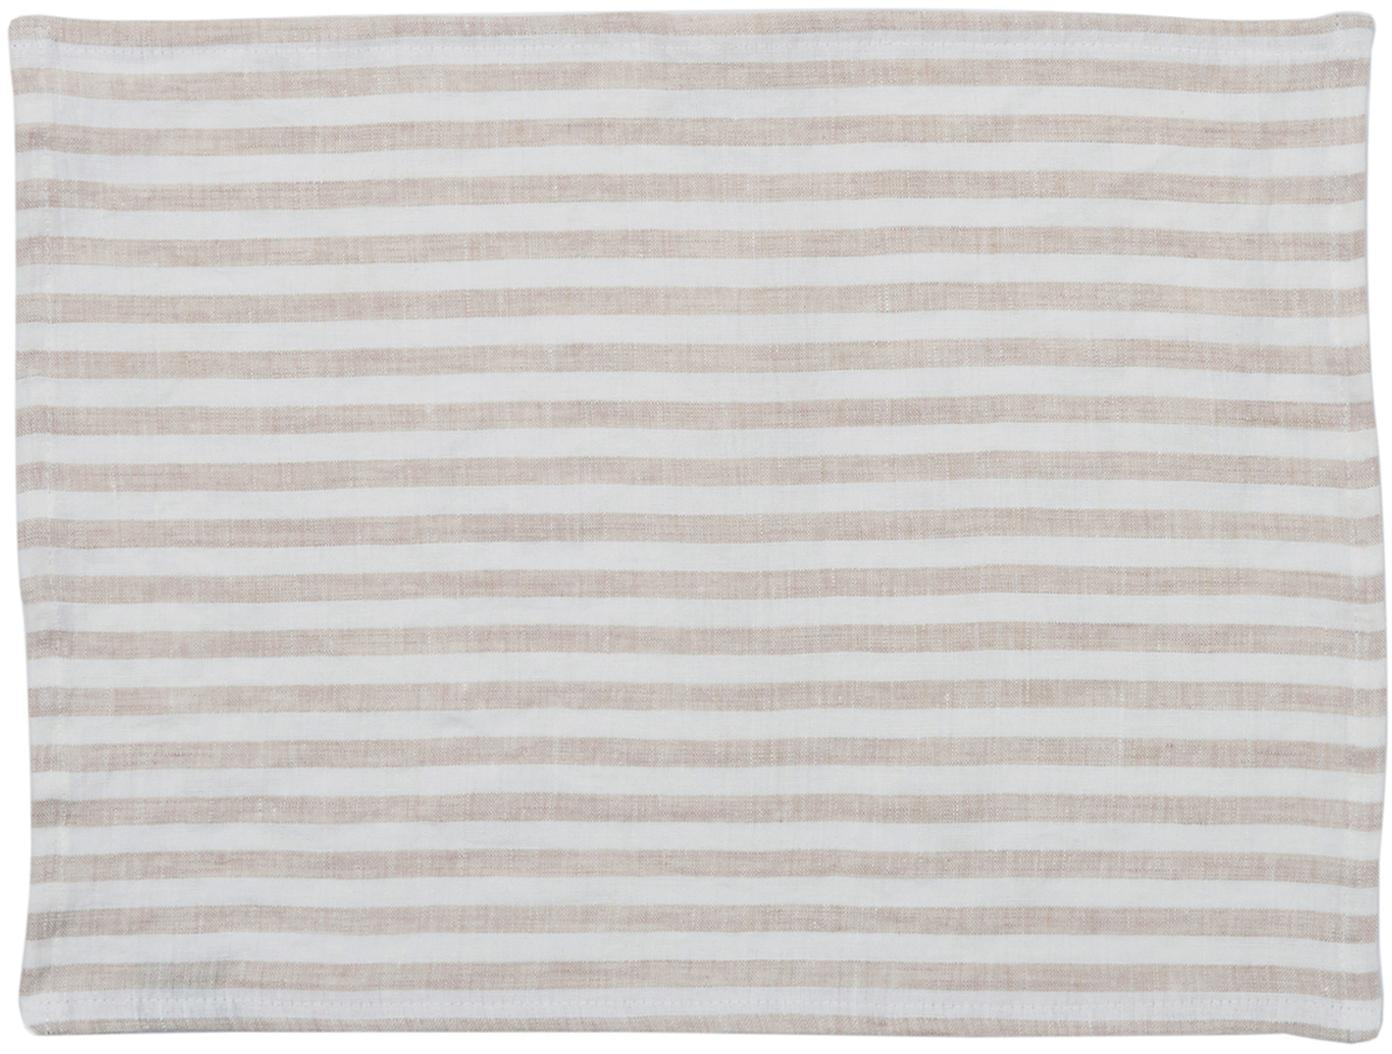 Manteles individuales de lino Solami, 2uds., Lino, Beige, blanco, An 35 x L 45 cm